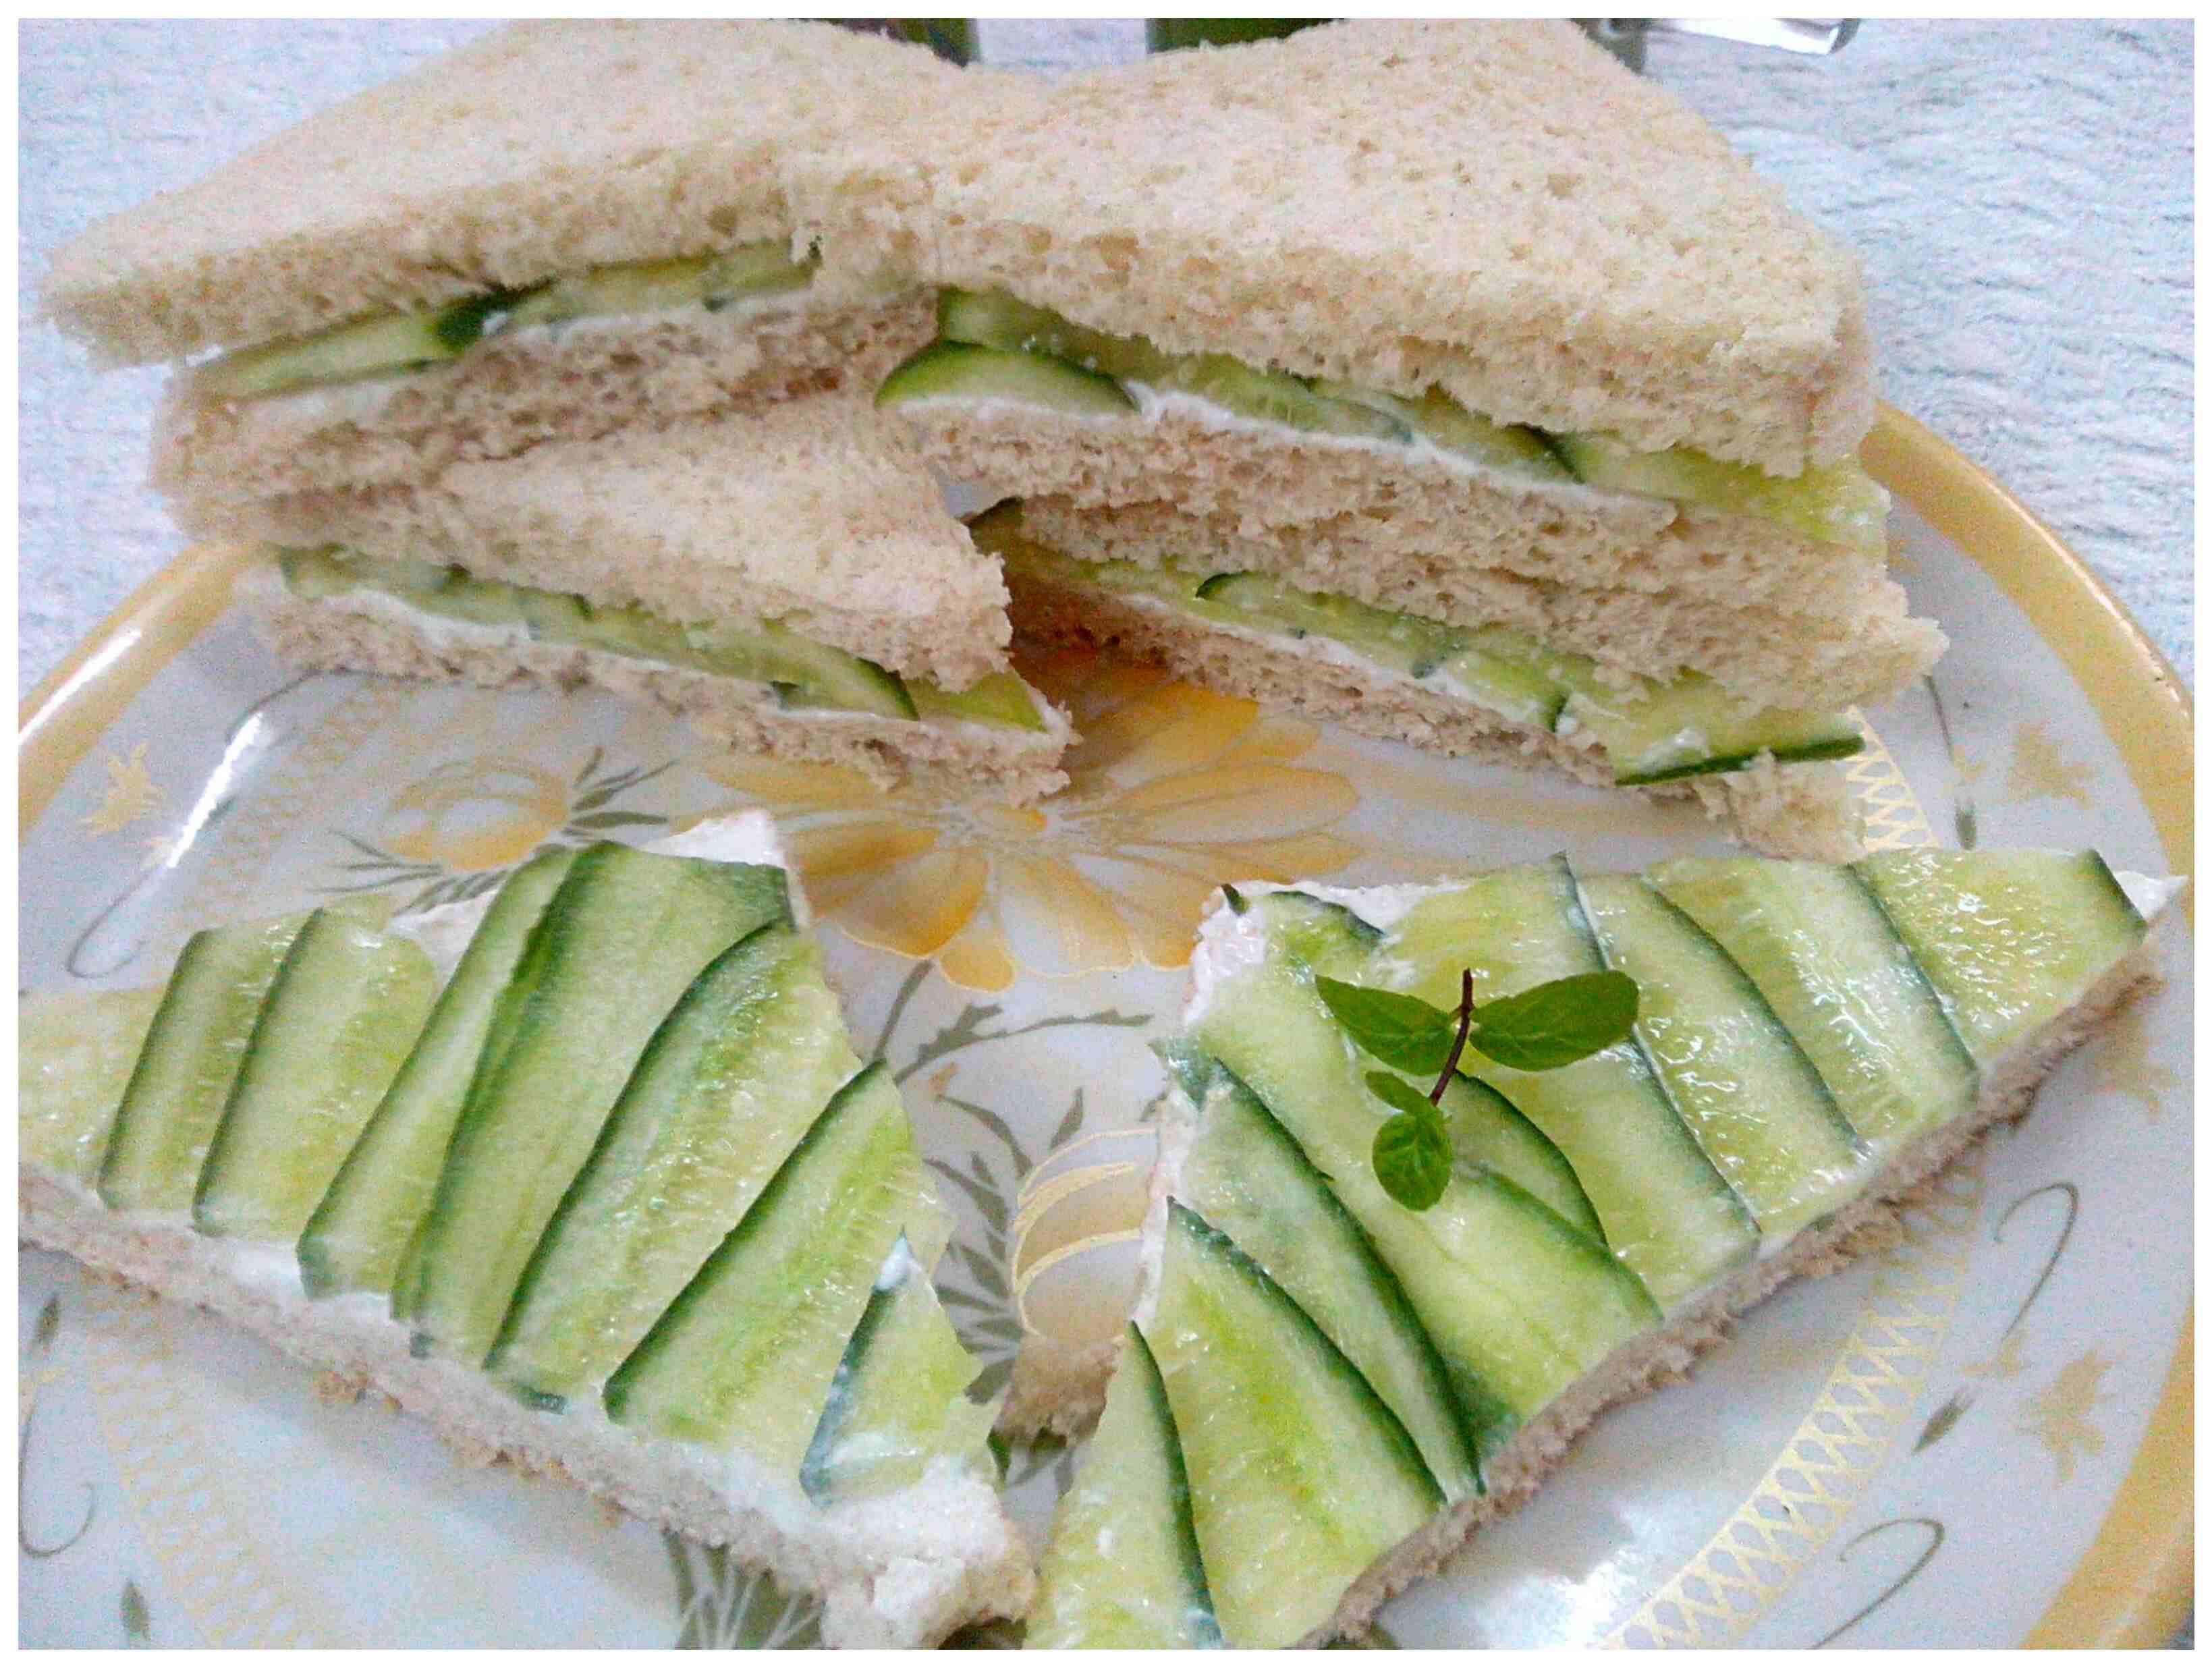 COOL CUCUMBER SANDWICH | MY KITCHETTE